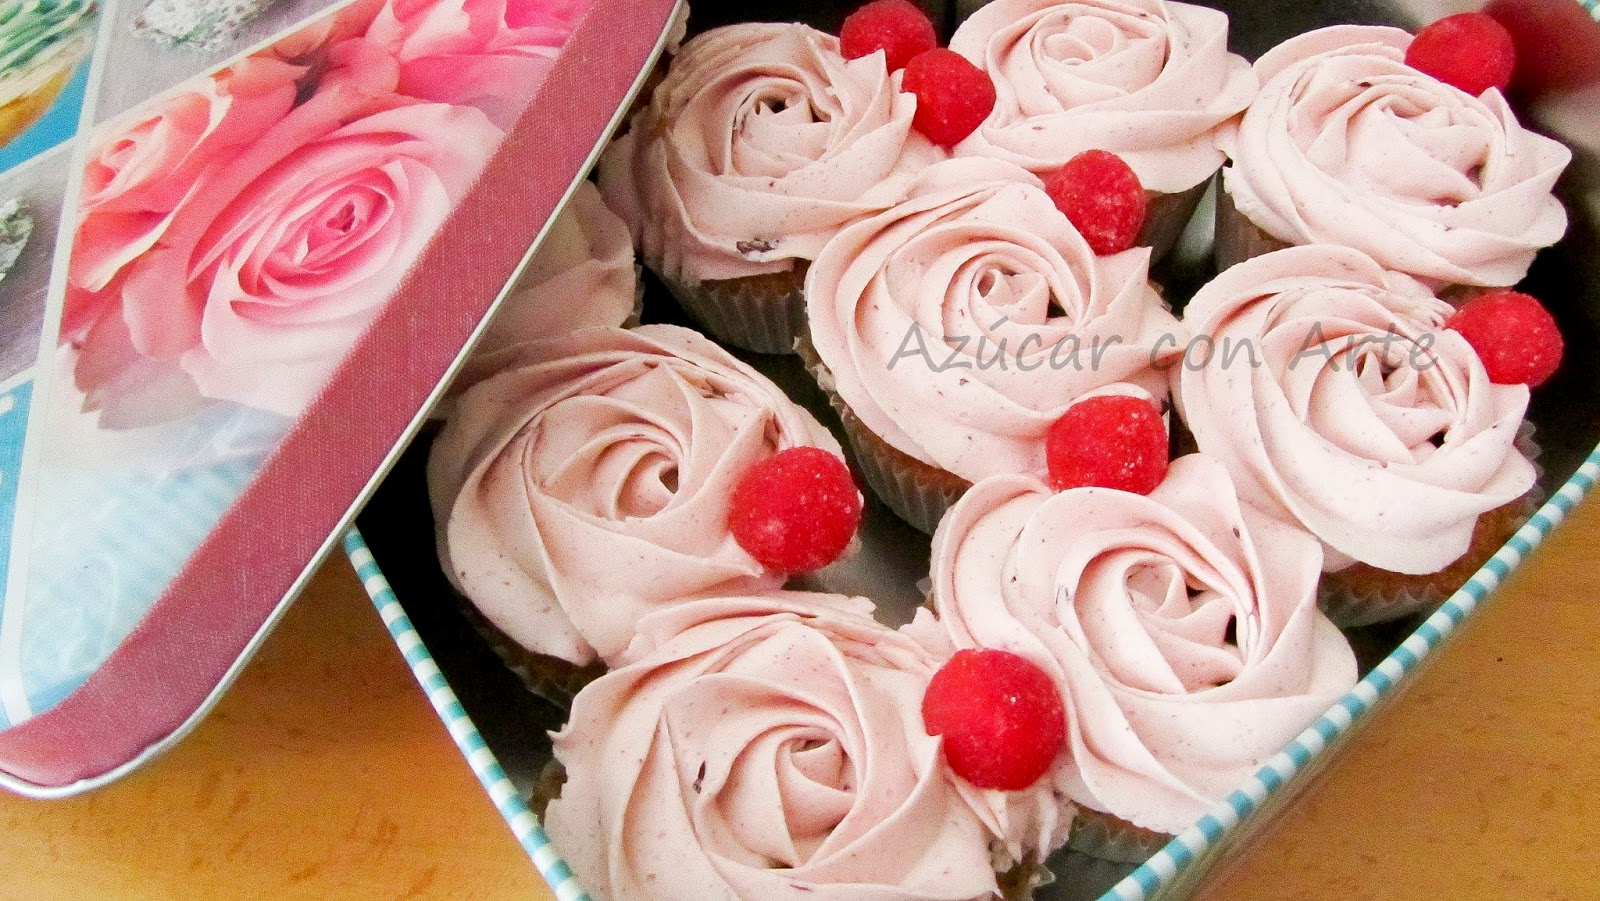 cupcakes sin gluten, gluten free cake | azucar con arte